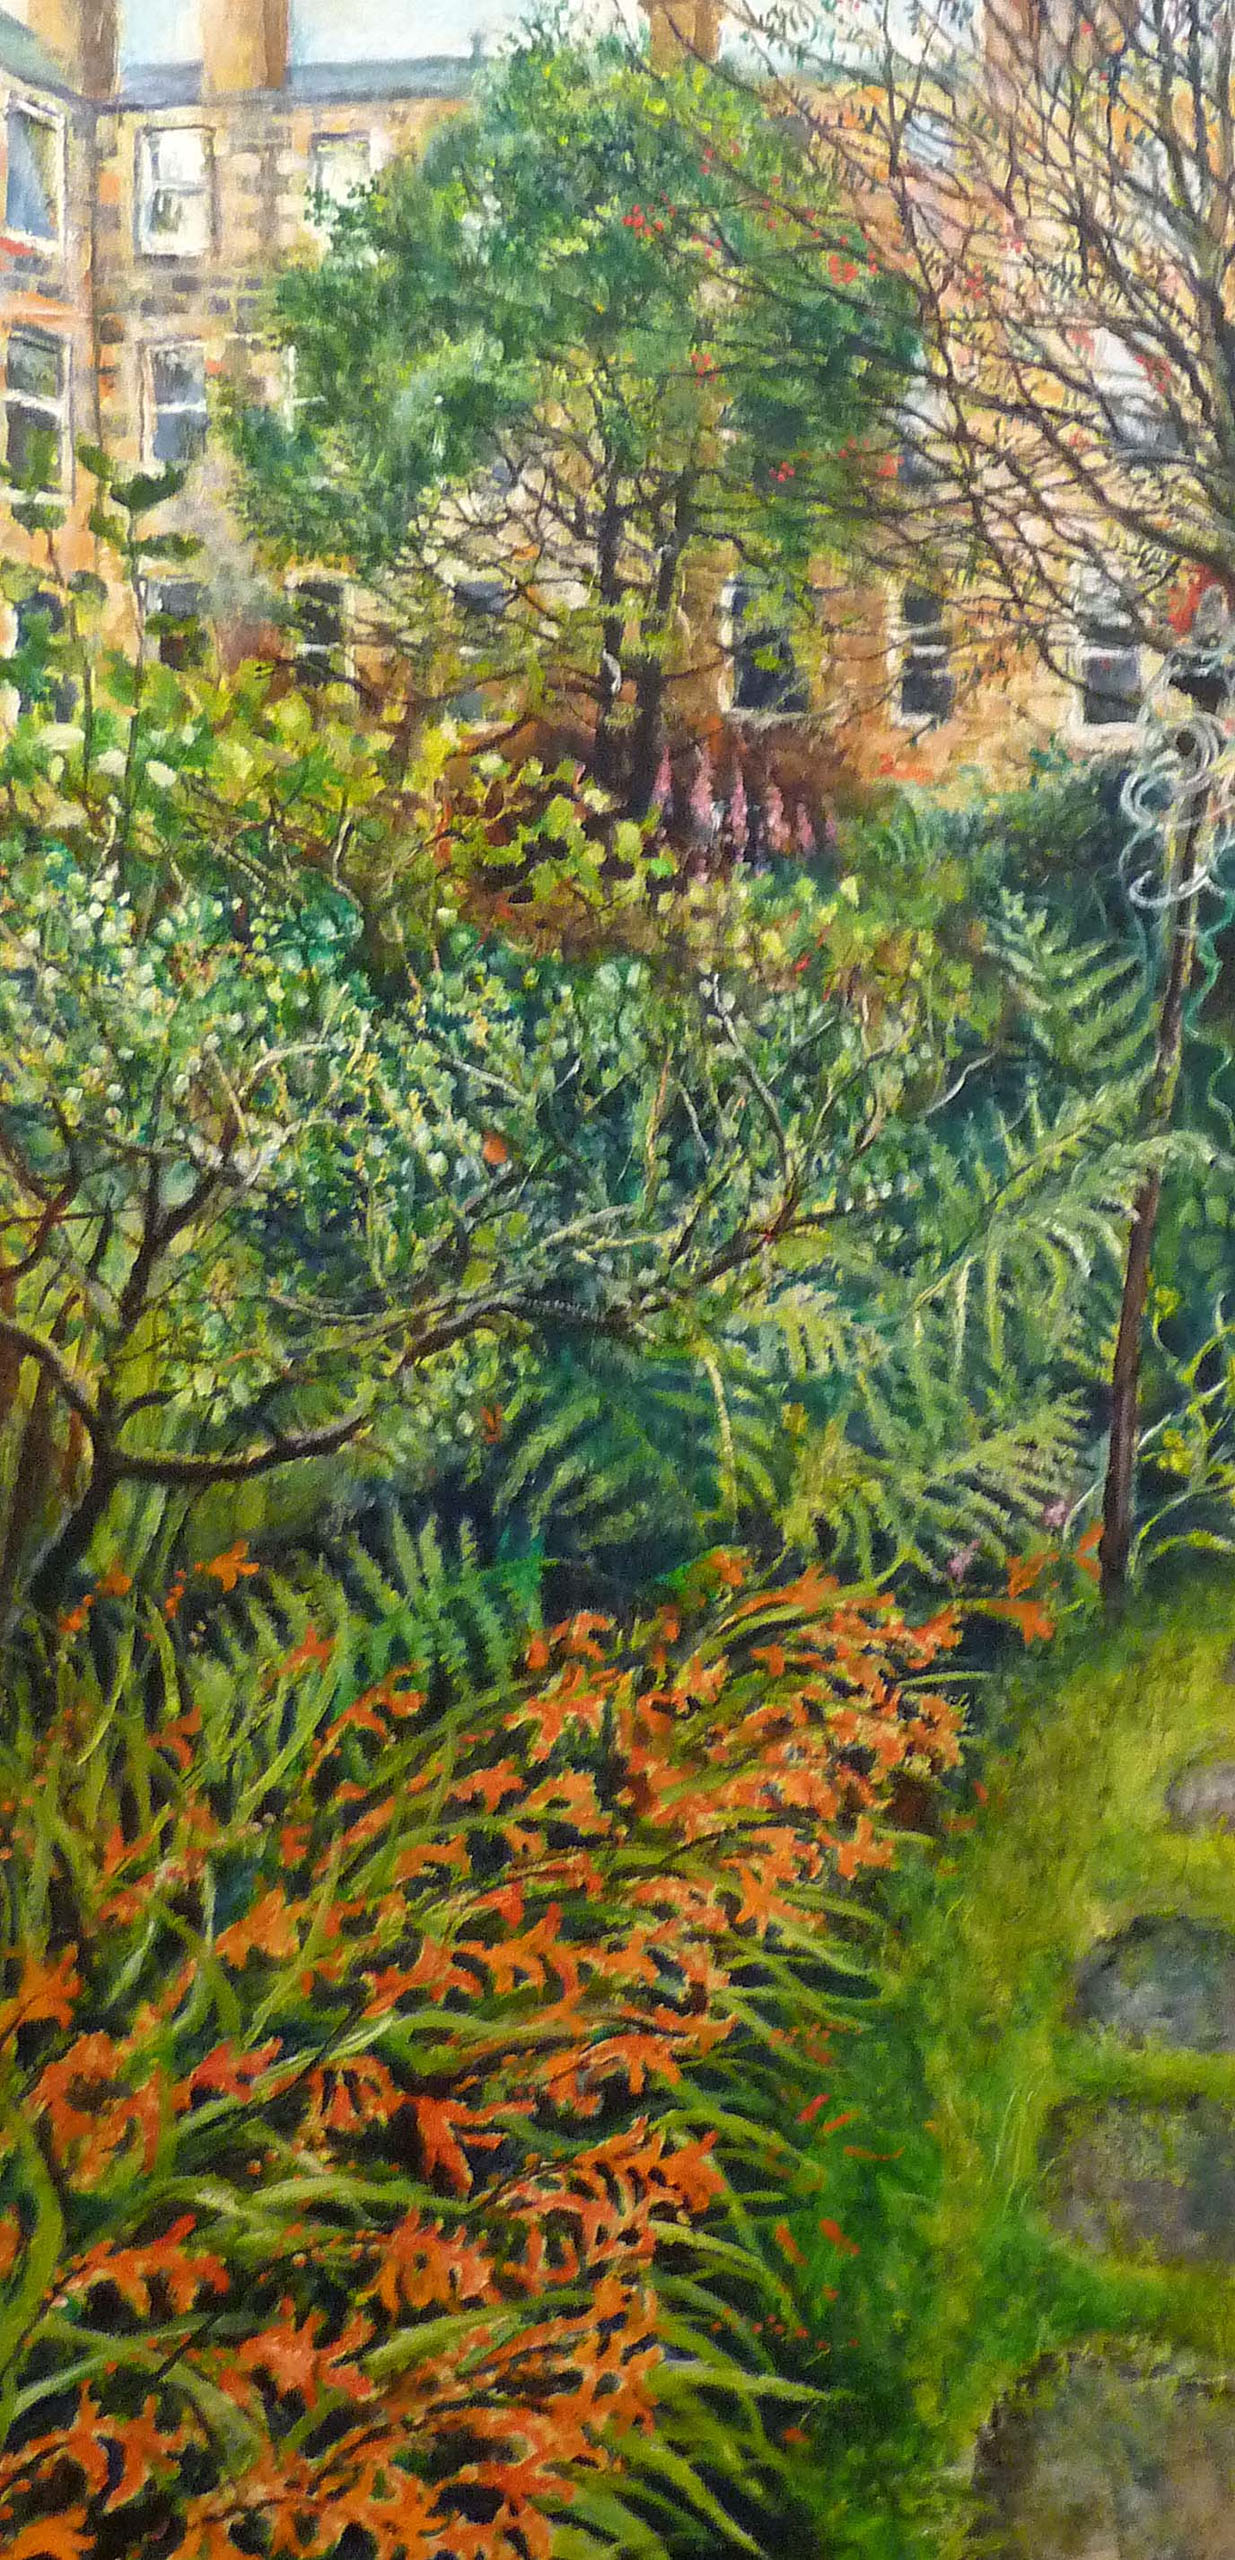 Sarah Longley_-_Back Garden Triptych 1 - Montbretia and Rowan Tree_oil on board_138 x 70cm.jpg